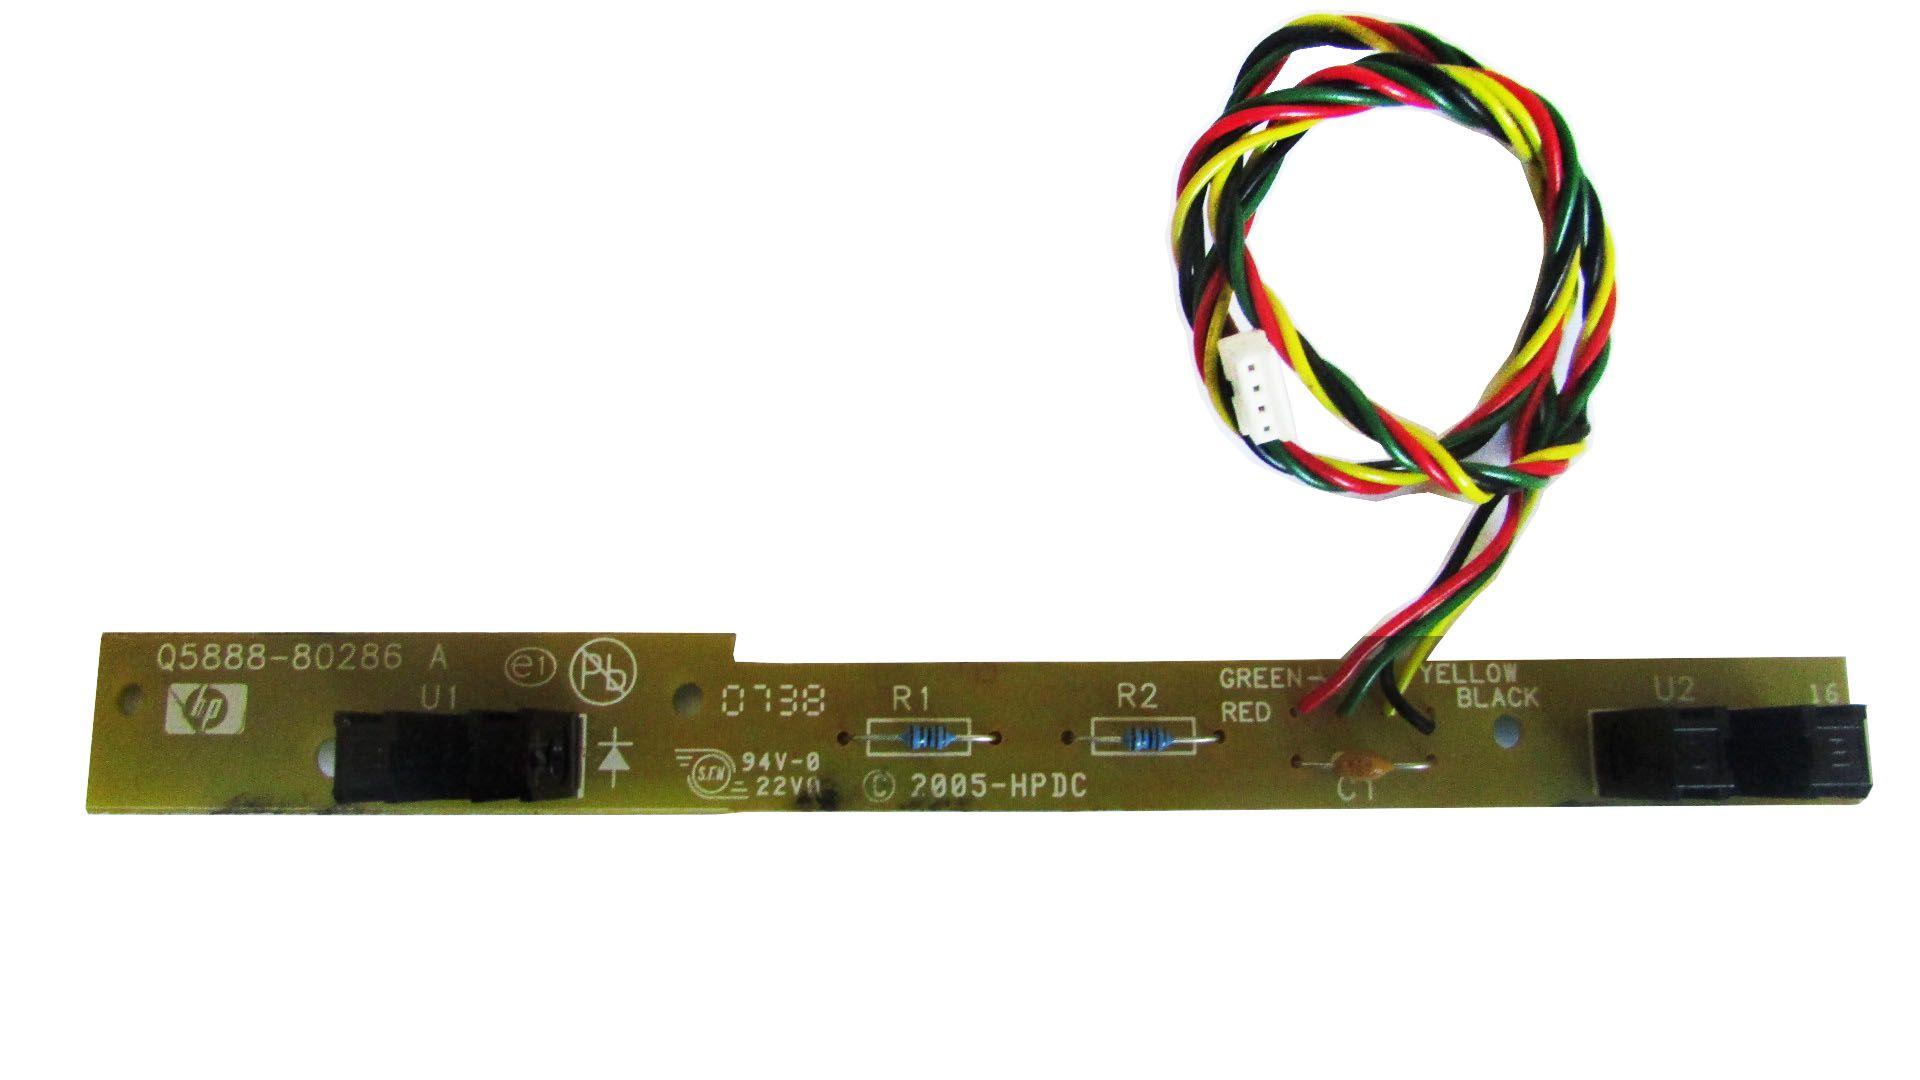 Placa Sensor Do Papel Impressora HP C4480 C4280 Series P/N: Q5888-80286 (semi novo)